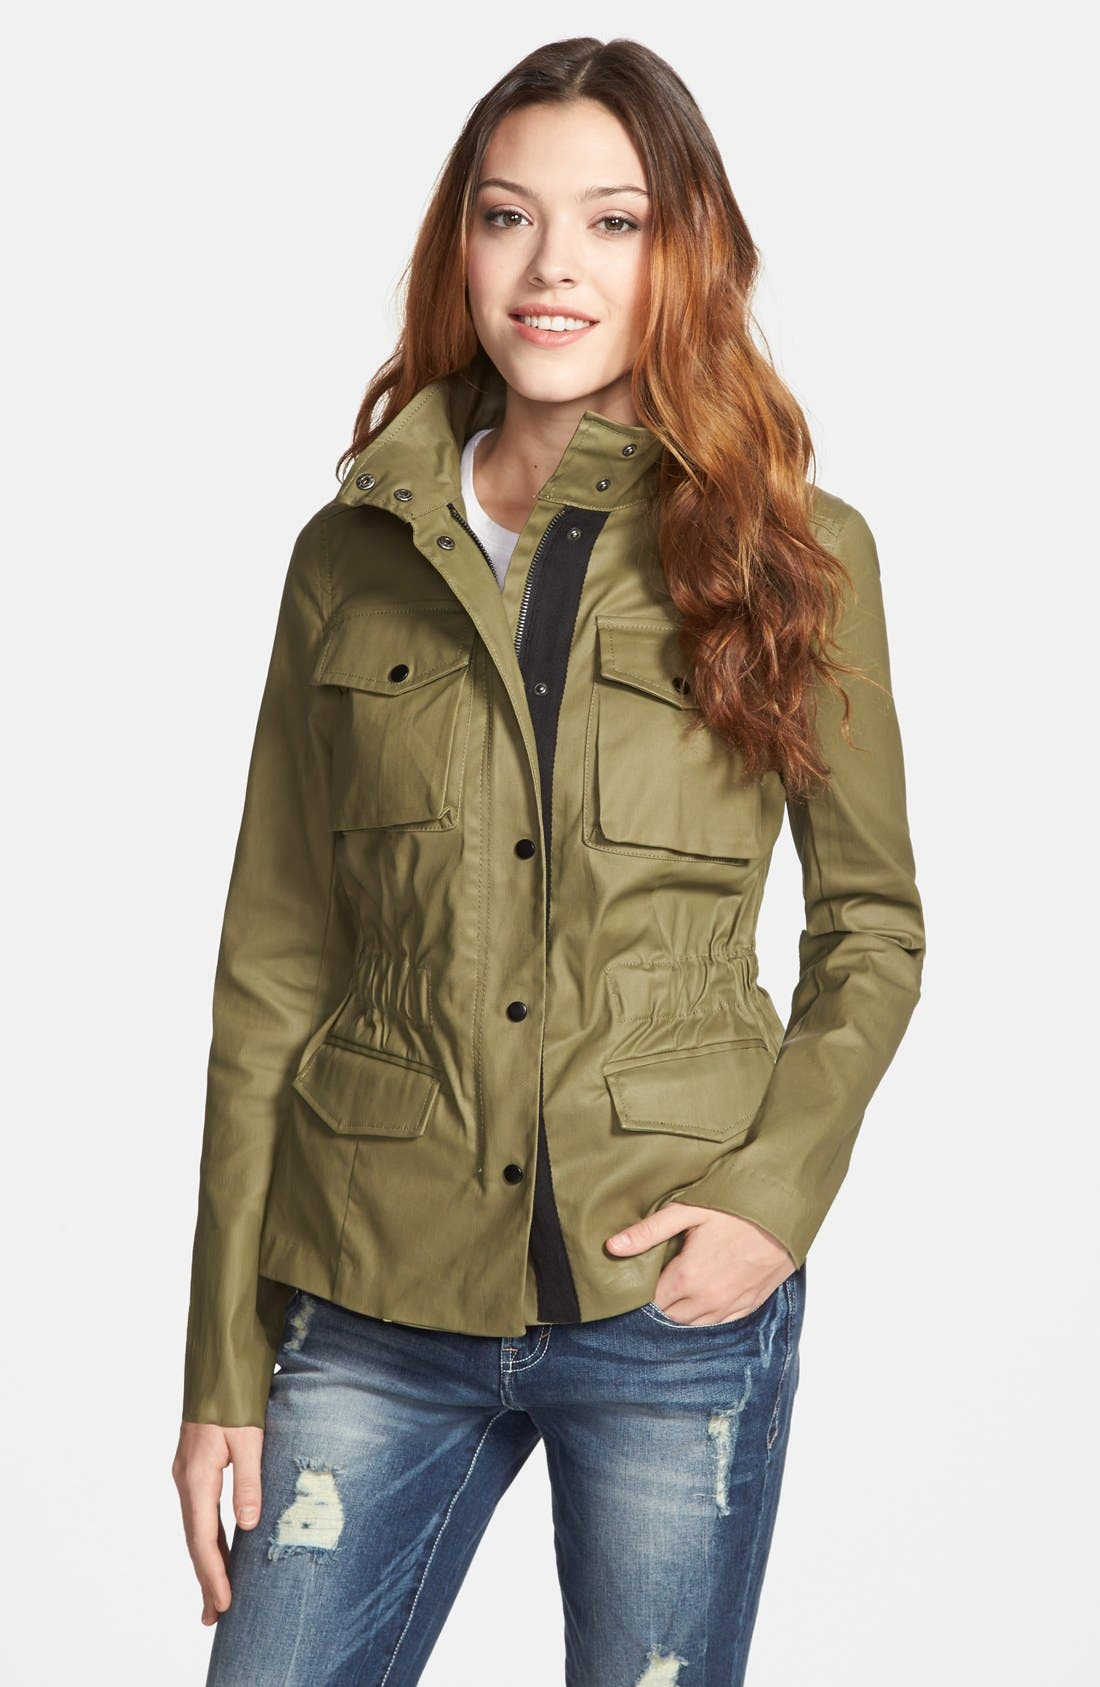 Alternate Image 1 Selected - kensie Washed Cotton Anorak Jacket